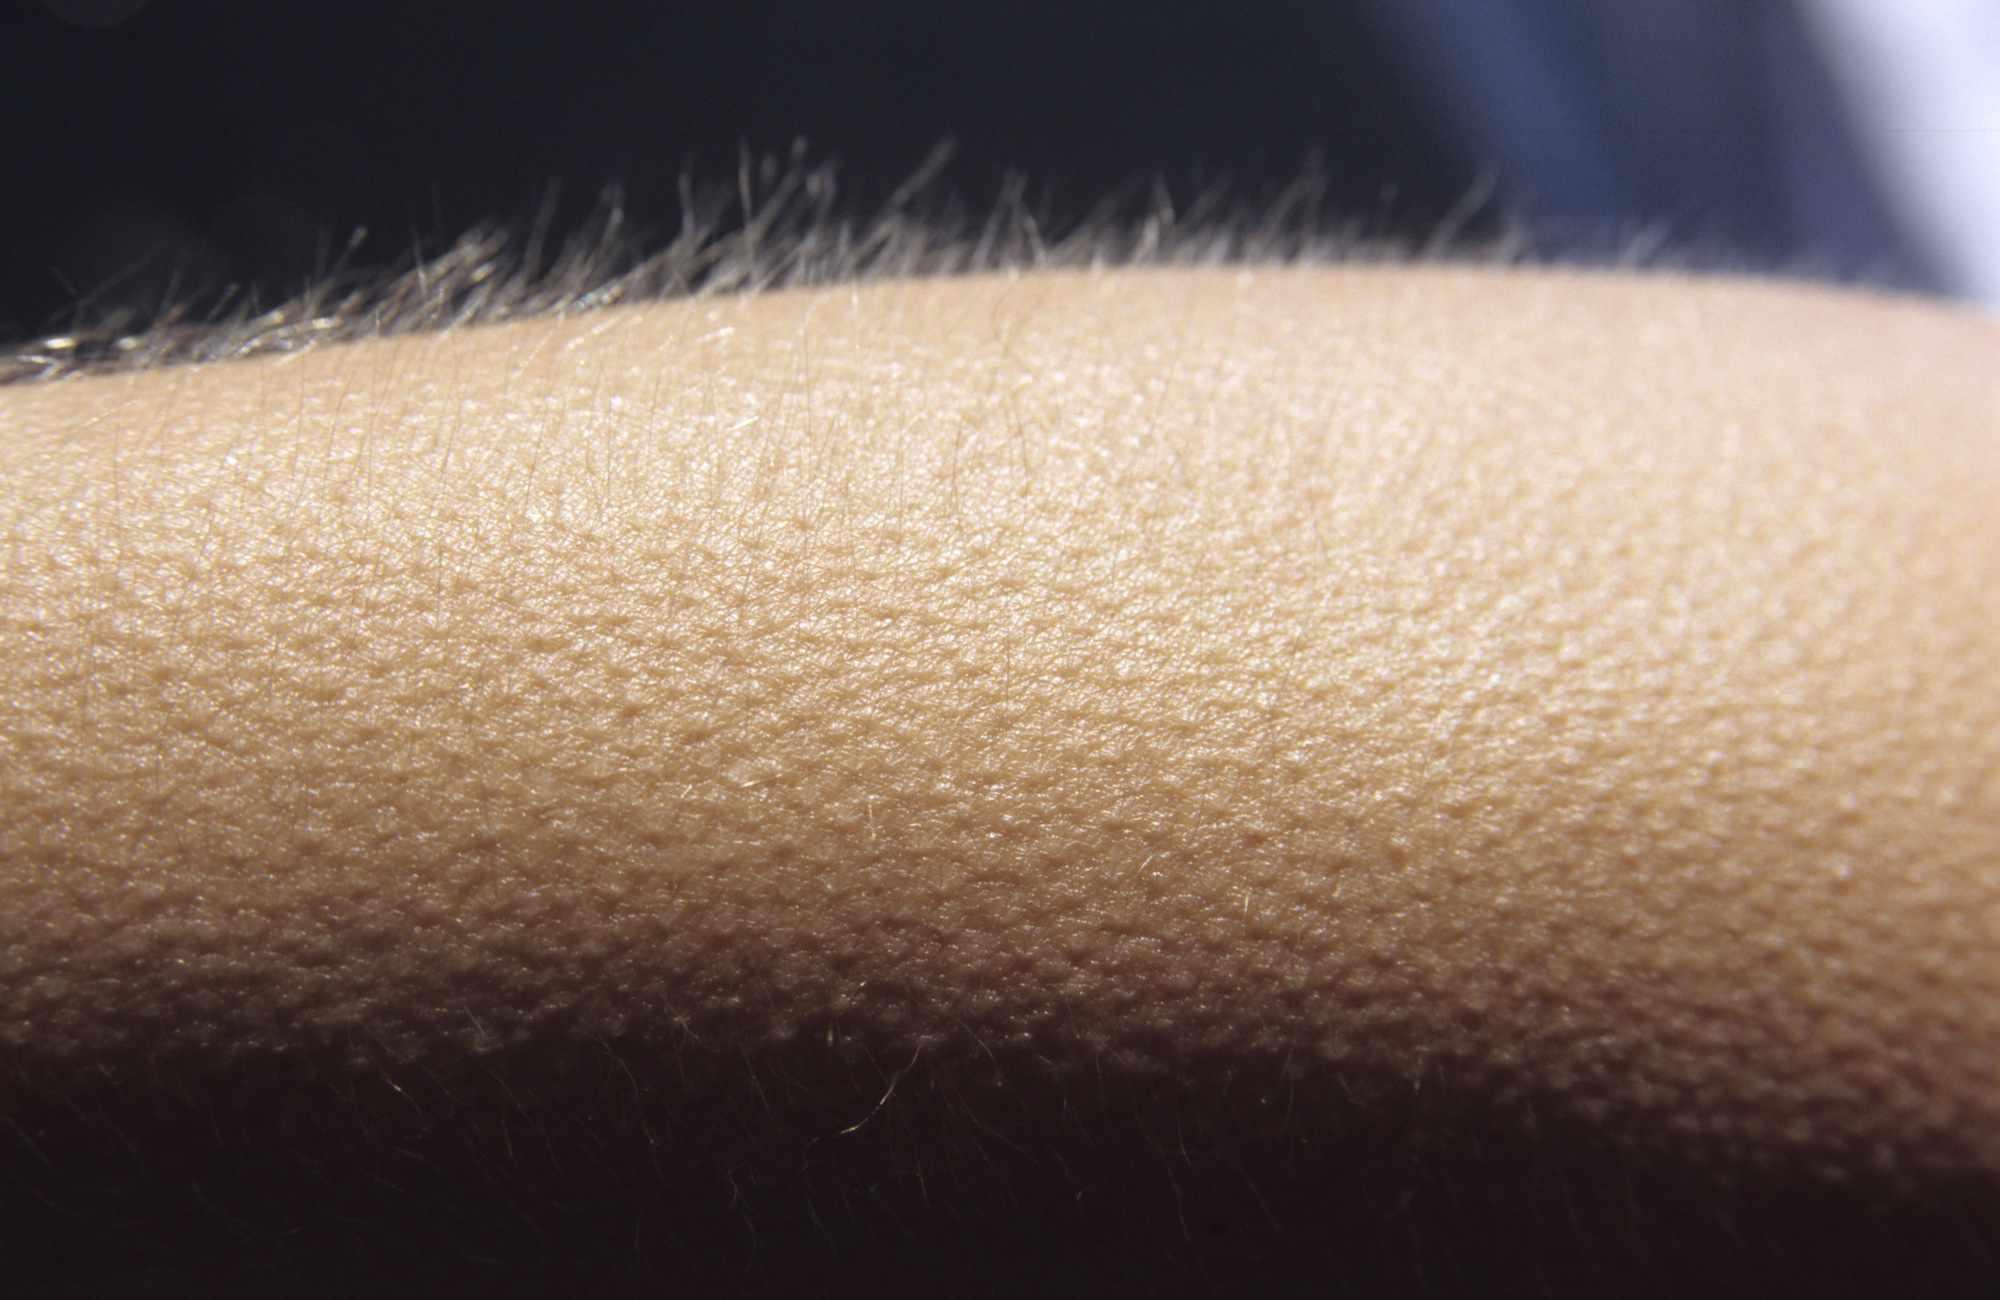 Goosebumps on a person's arm